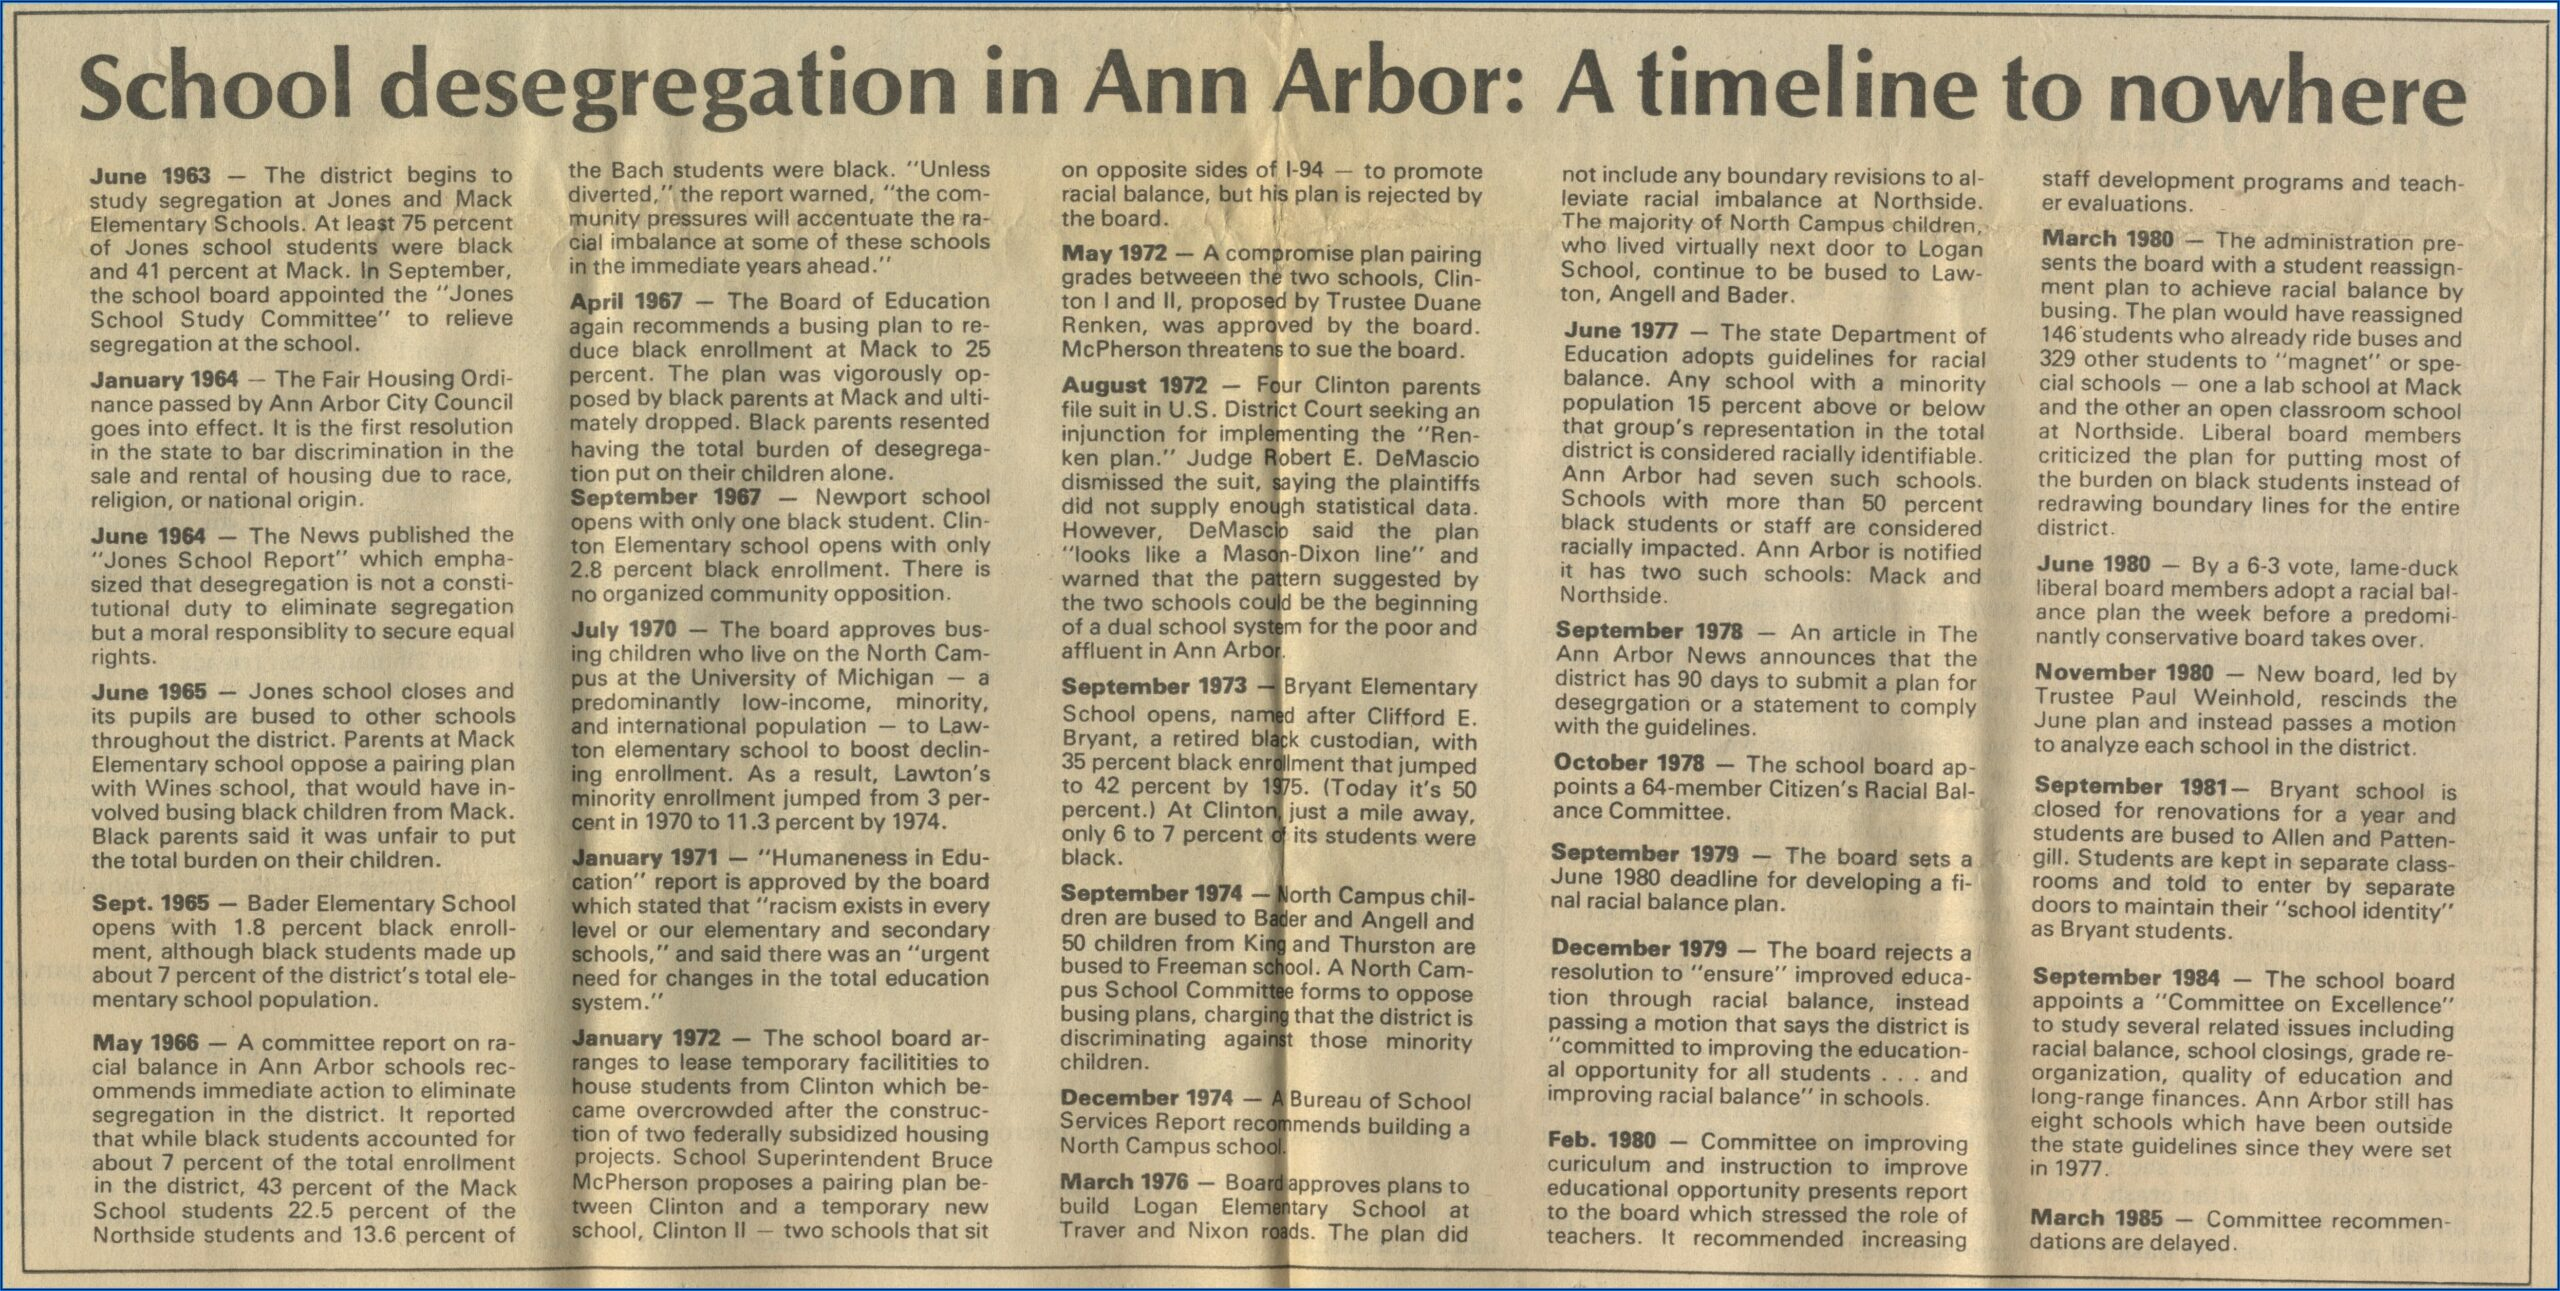 Desegregation Of Public Schools Timeline